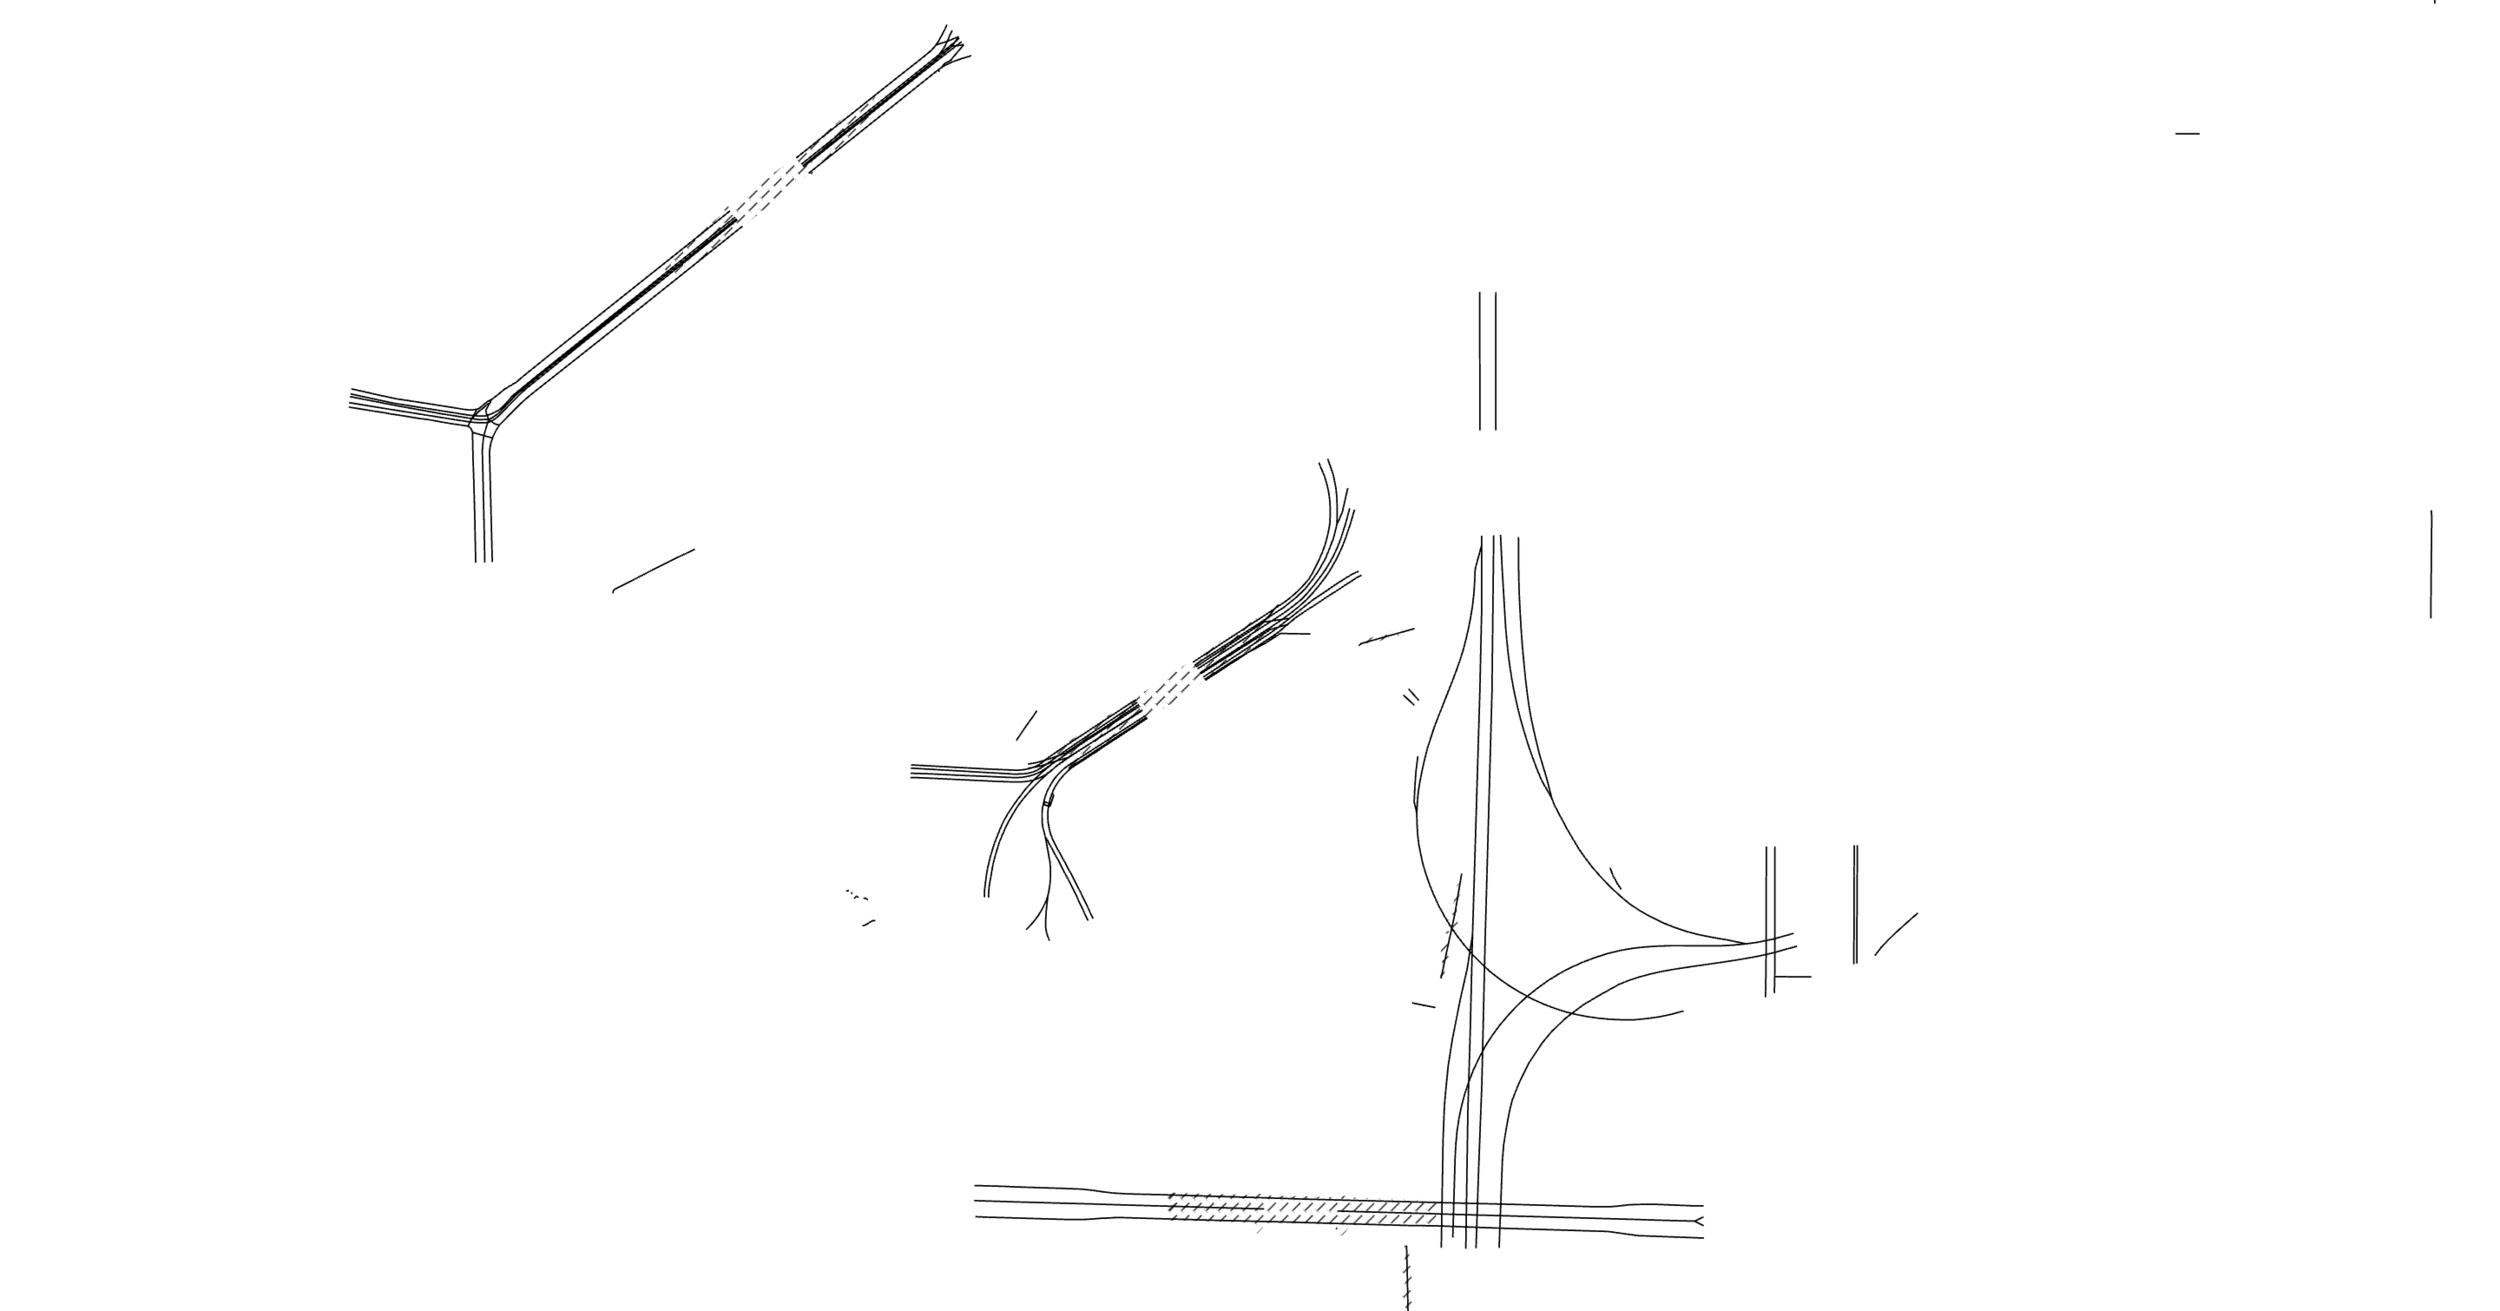 https://sensescape.github.io/morphology/#11%25252525252525252F45.5056%25252525252525252F-73.5734=&z=16.5&lat=45.52752&lng=-122.66752&form=bridges